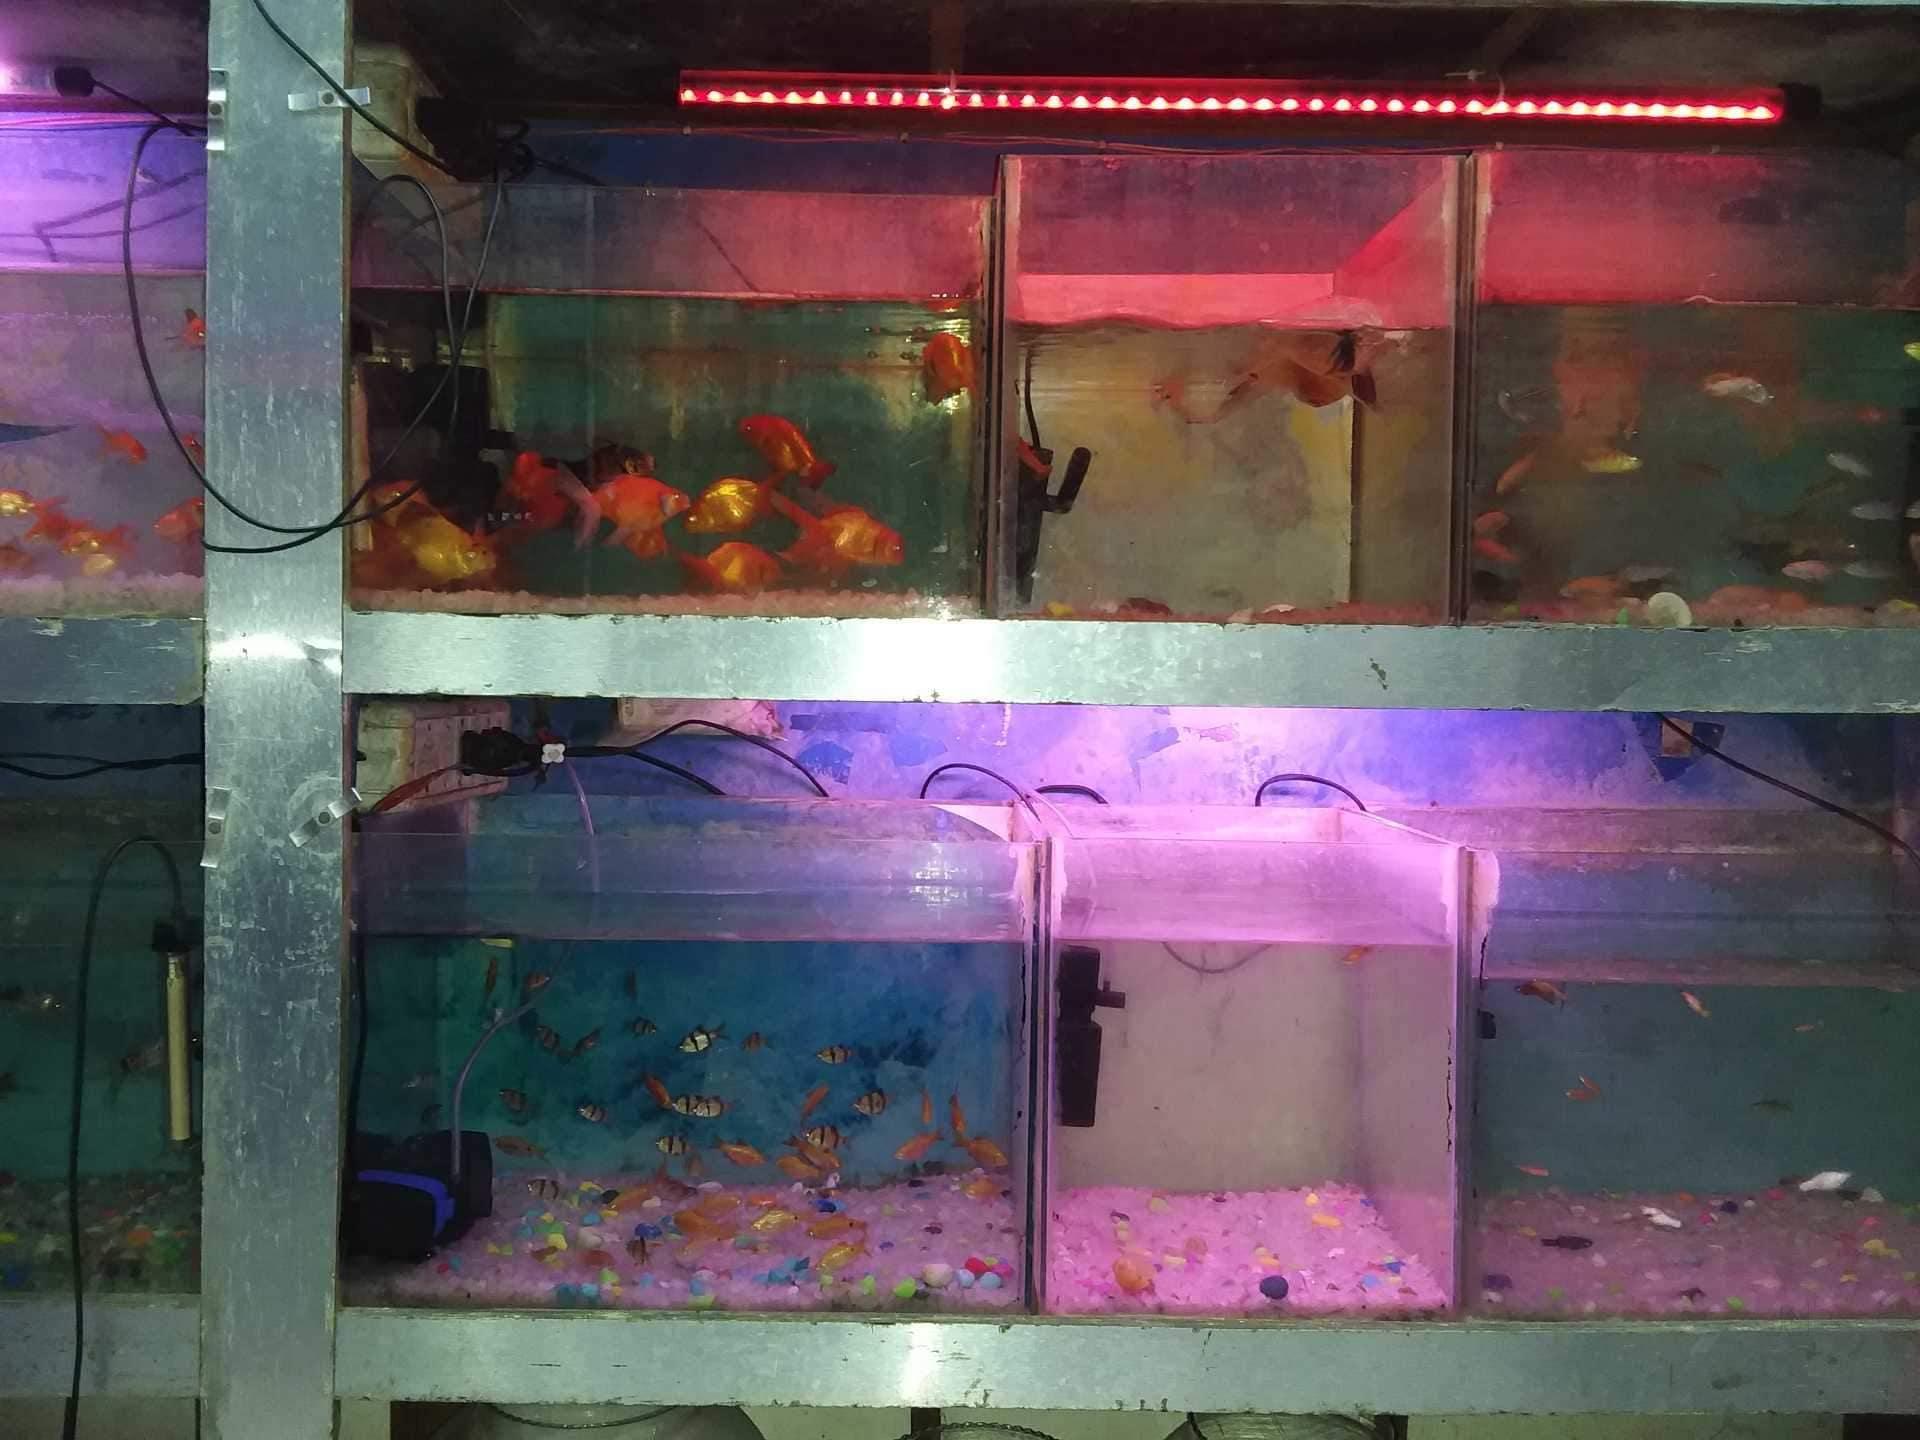 Top 100 Fish Aquarium Dealers In Delhi Best Fish Aquarium Shops